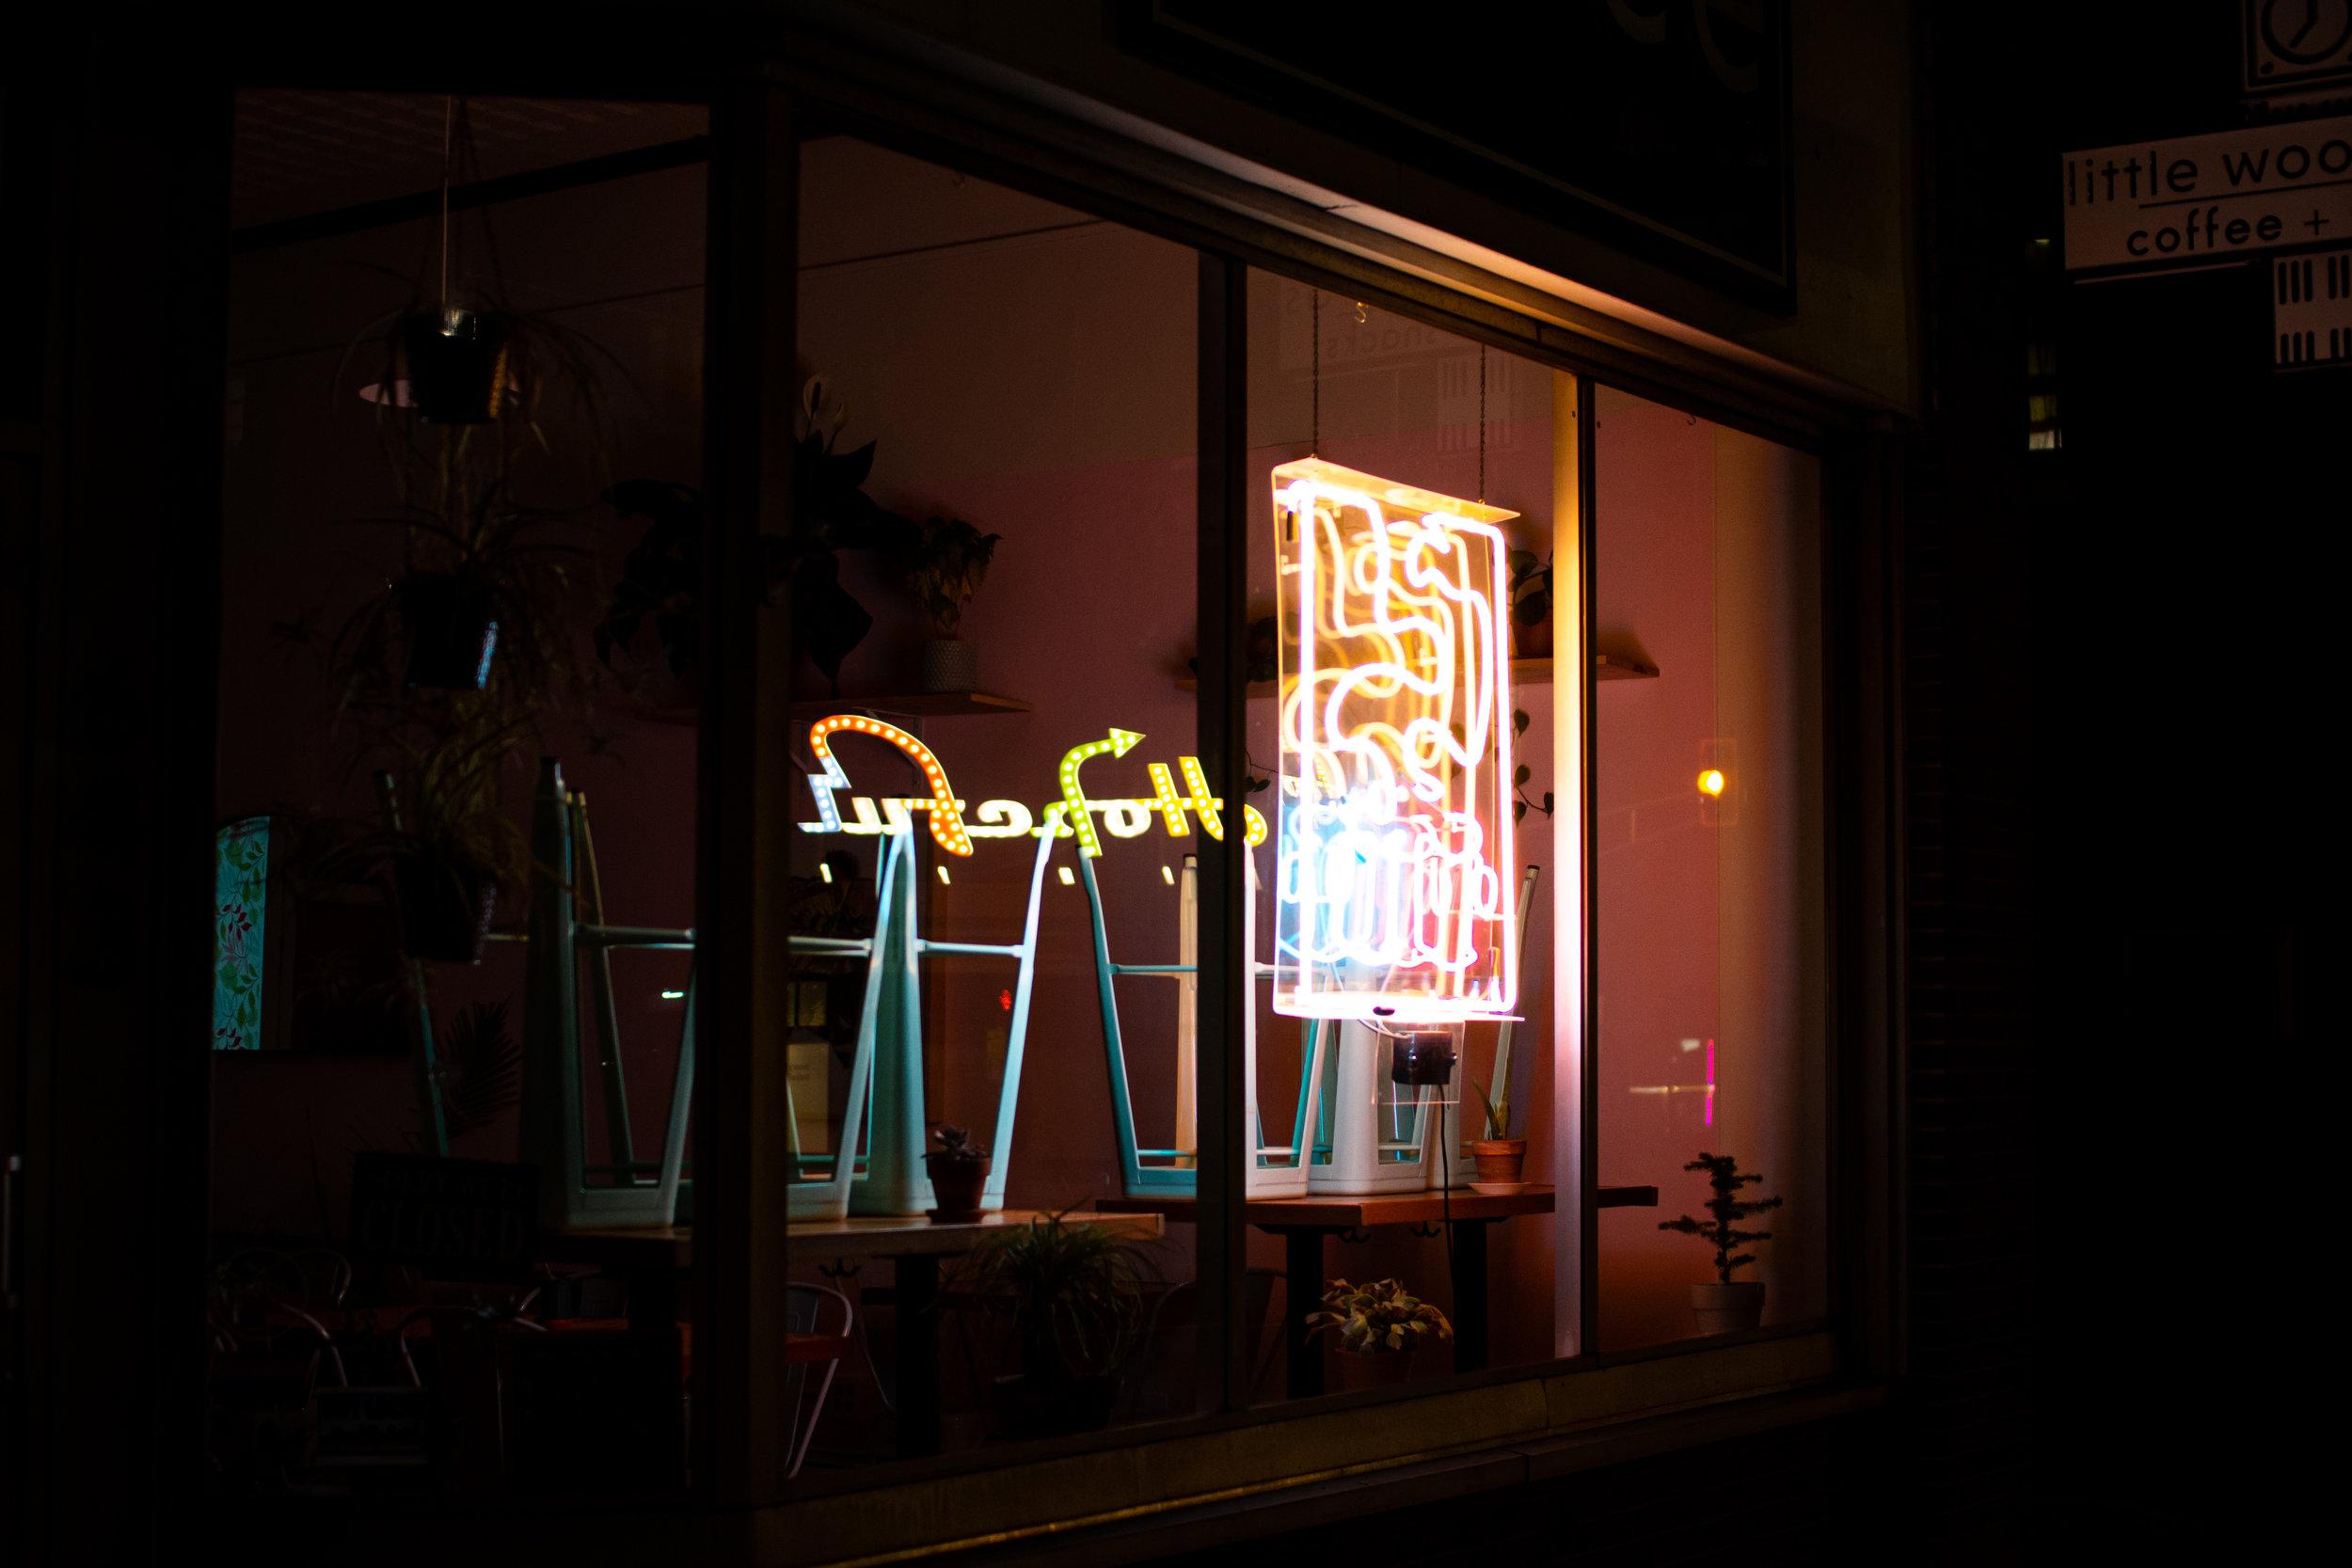 Hopeful Reflection, Portland, ME, 2019.